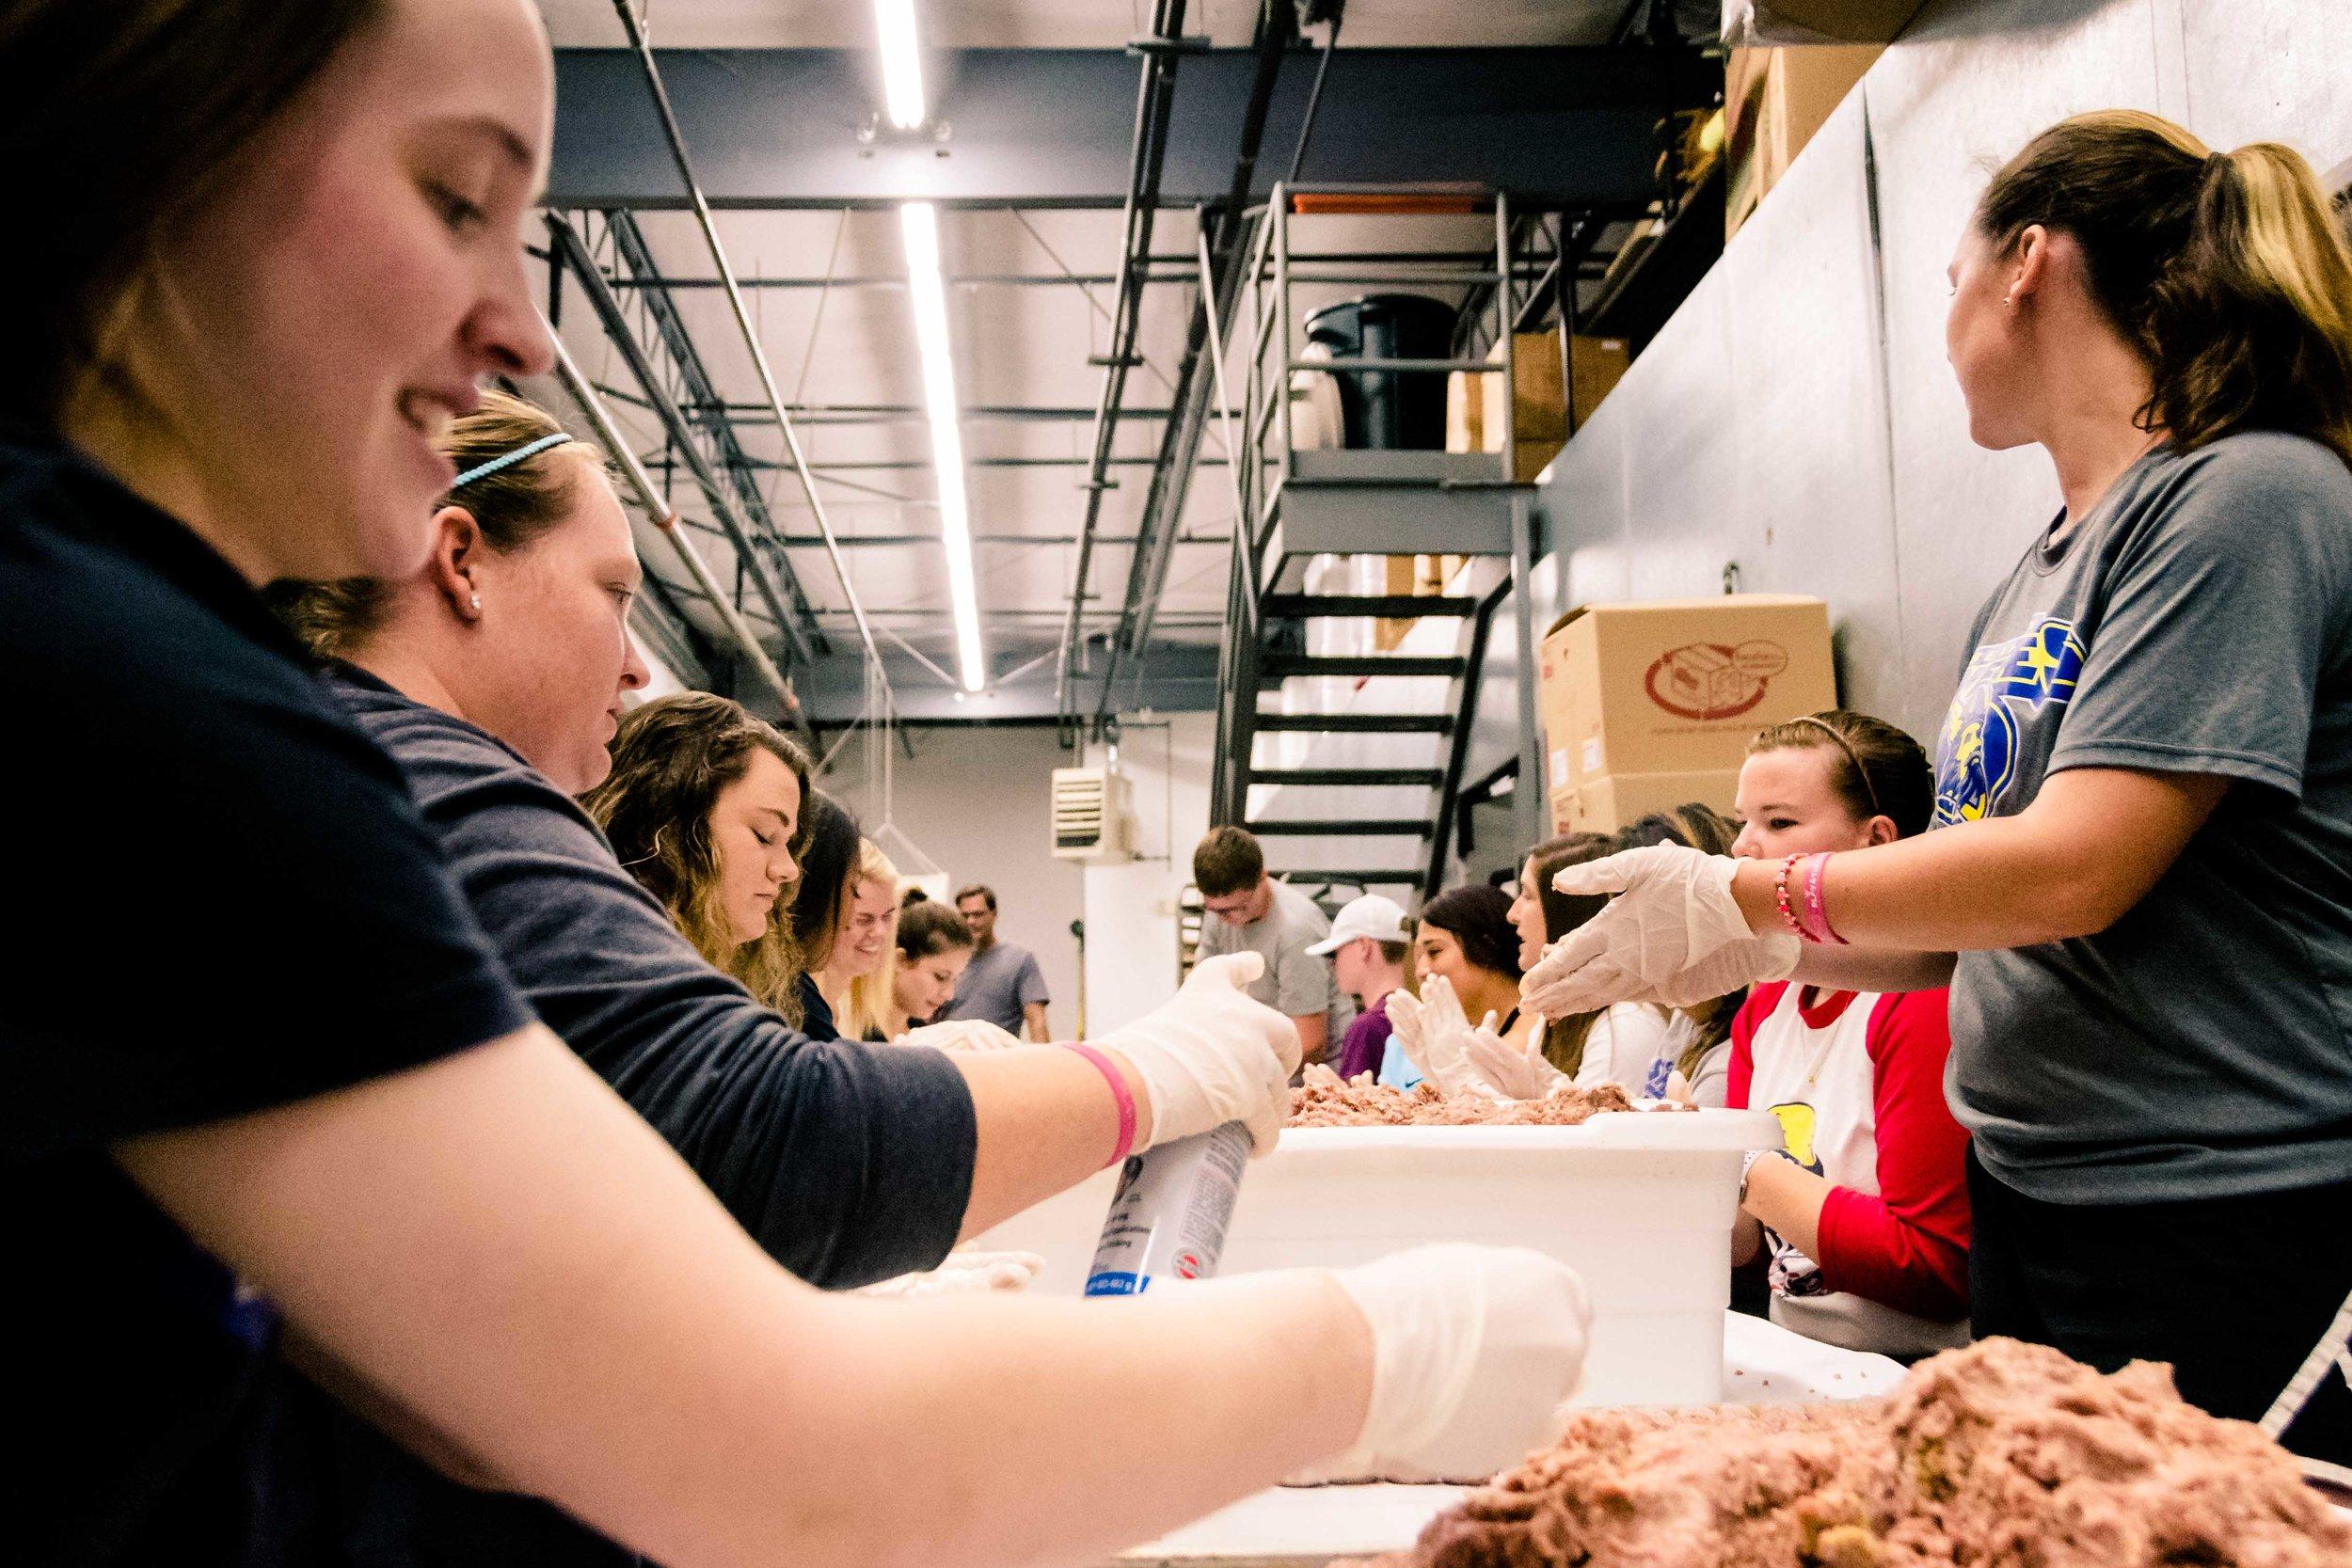 Bethany student Brittney Roush (left)of Visalia, Calif.,prepares meatballs with friends.